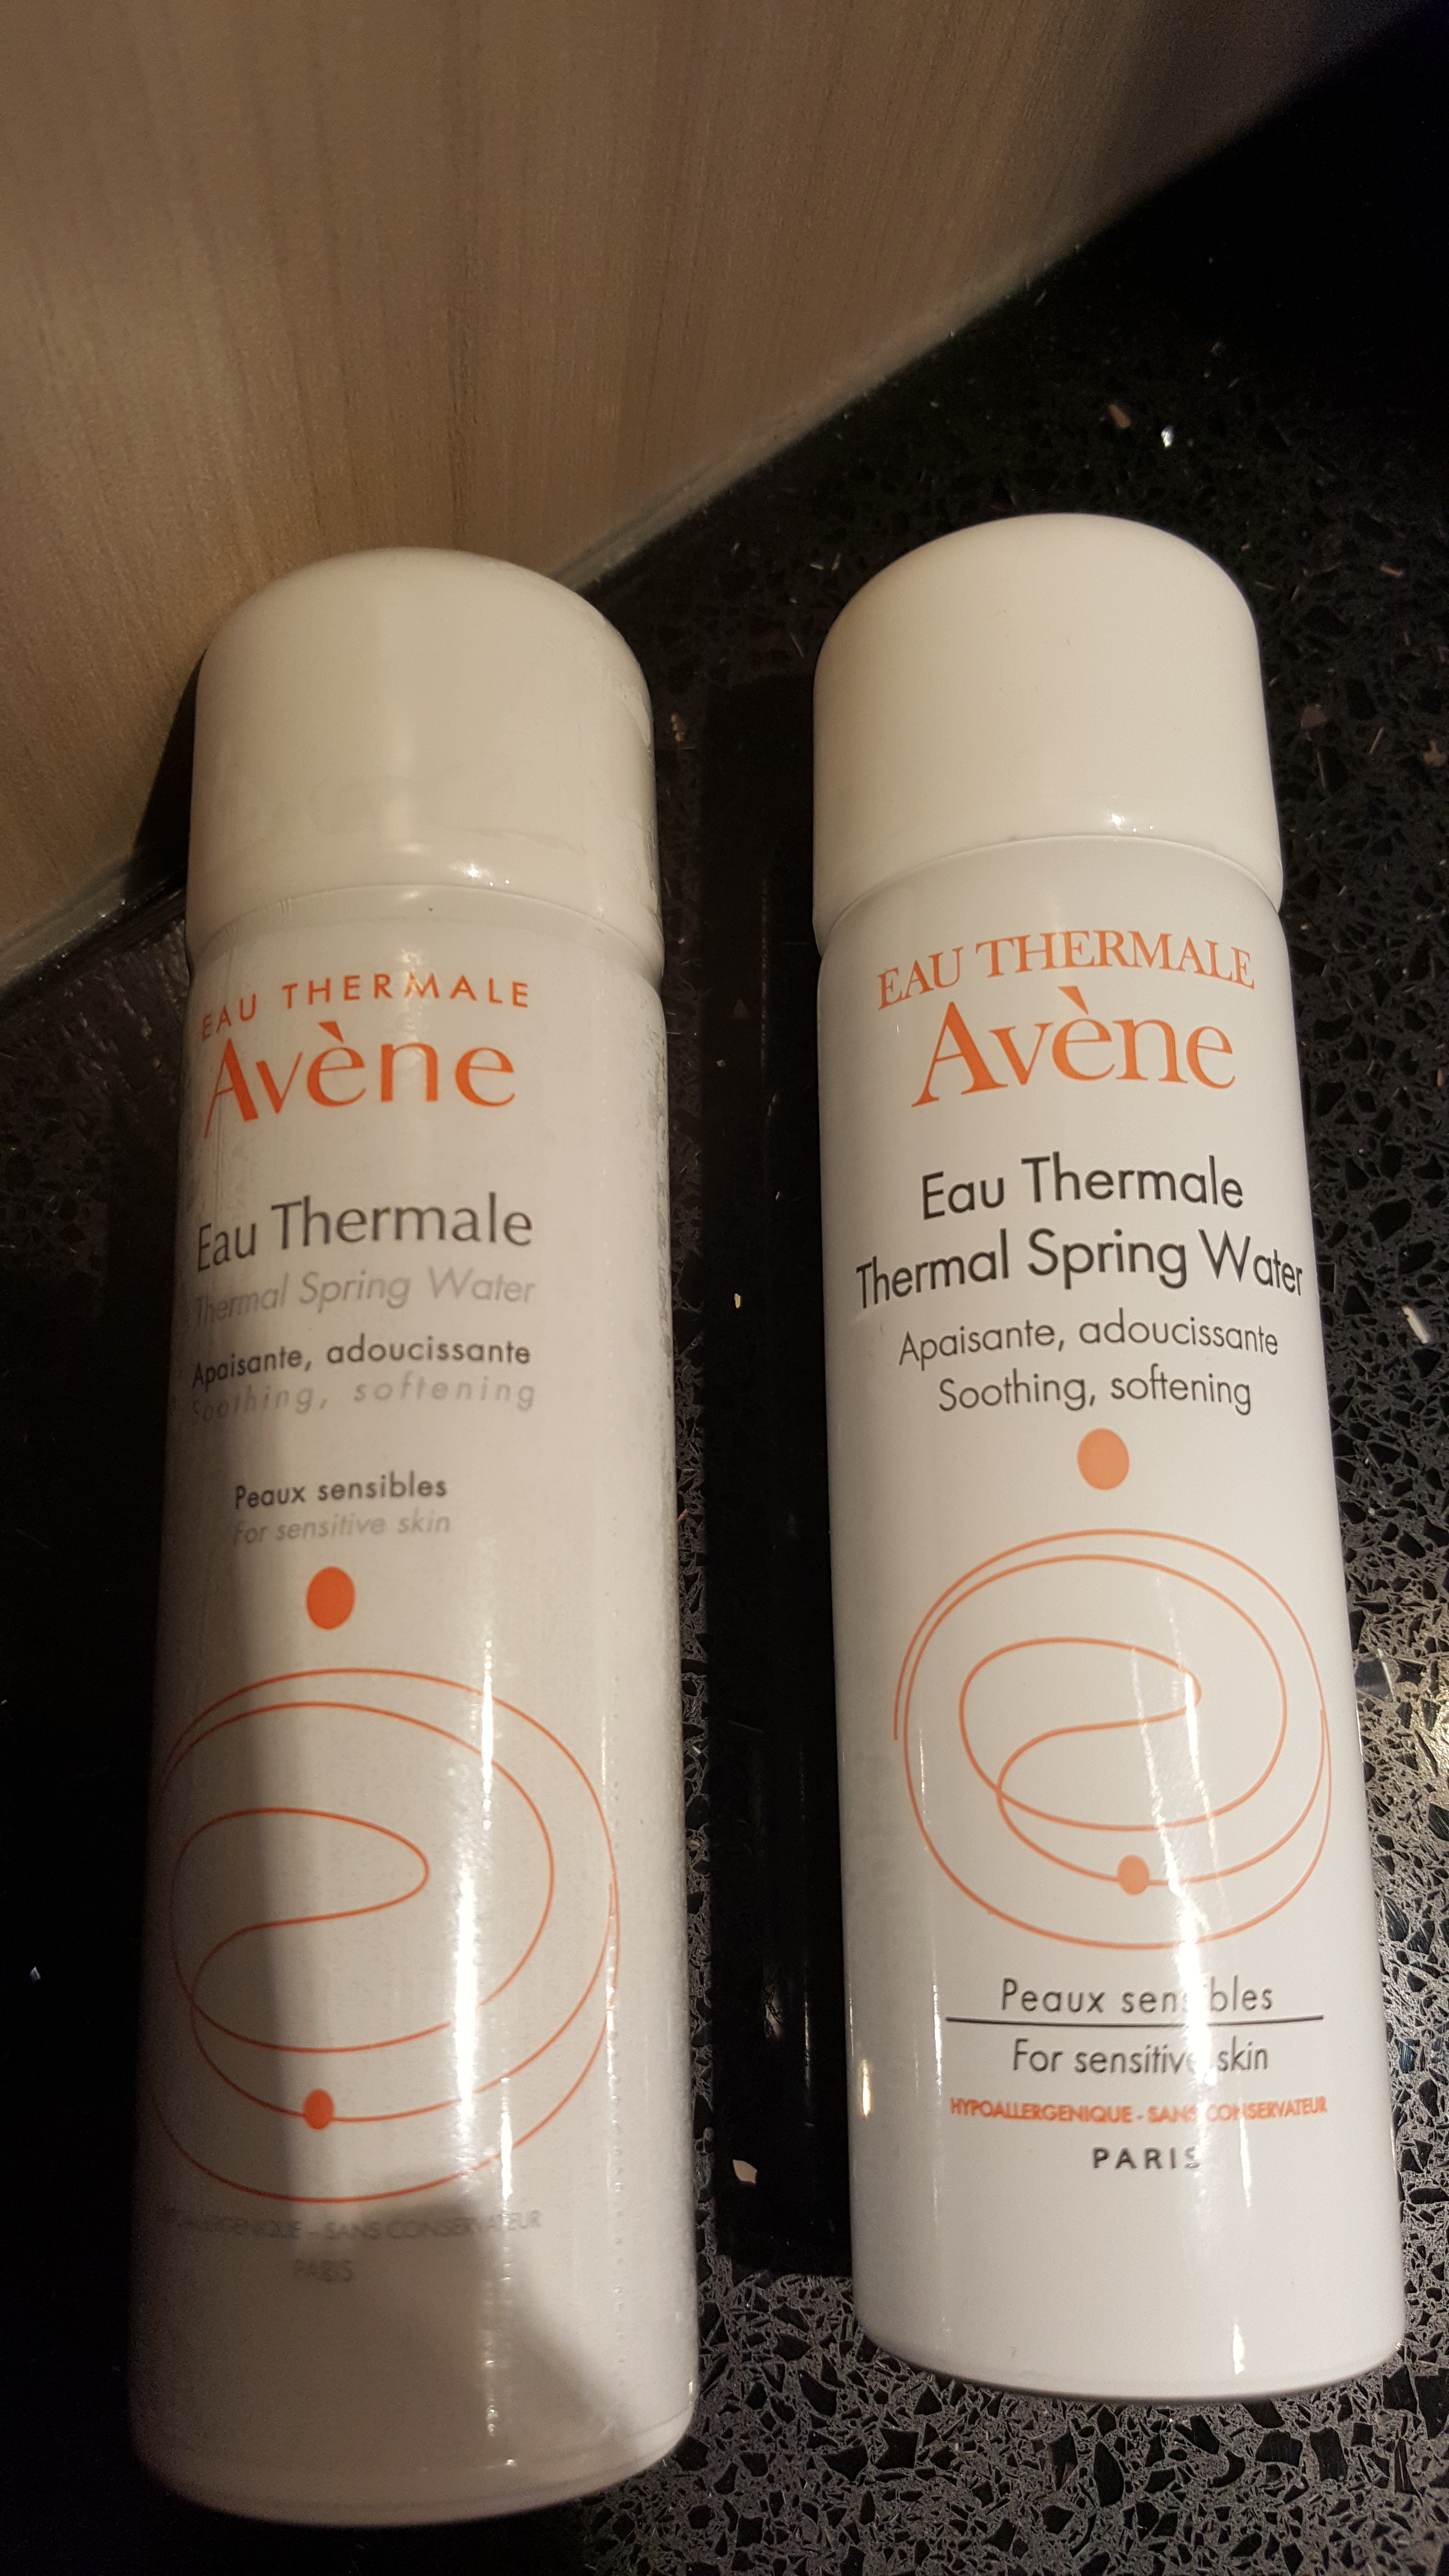 I'd love Facial spring thermal water